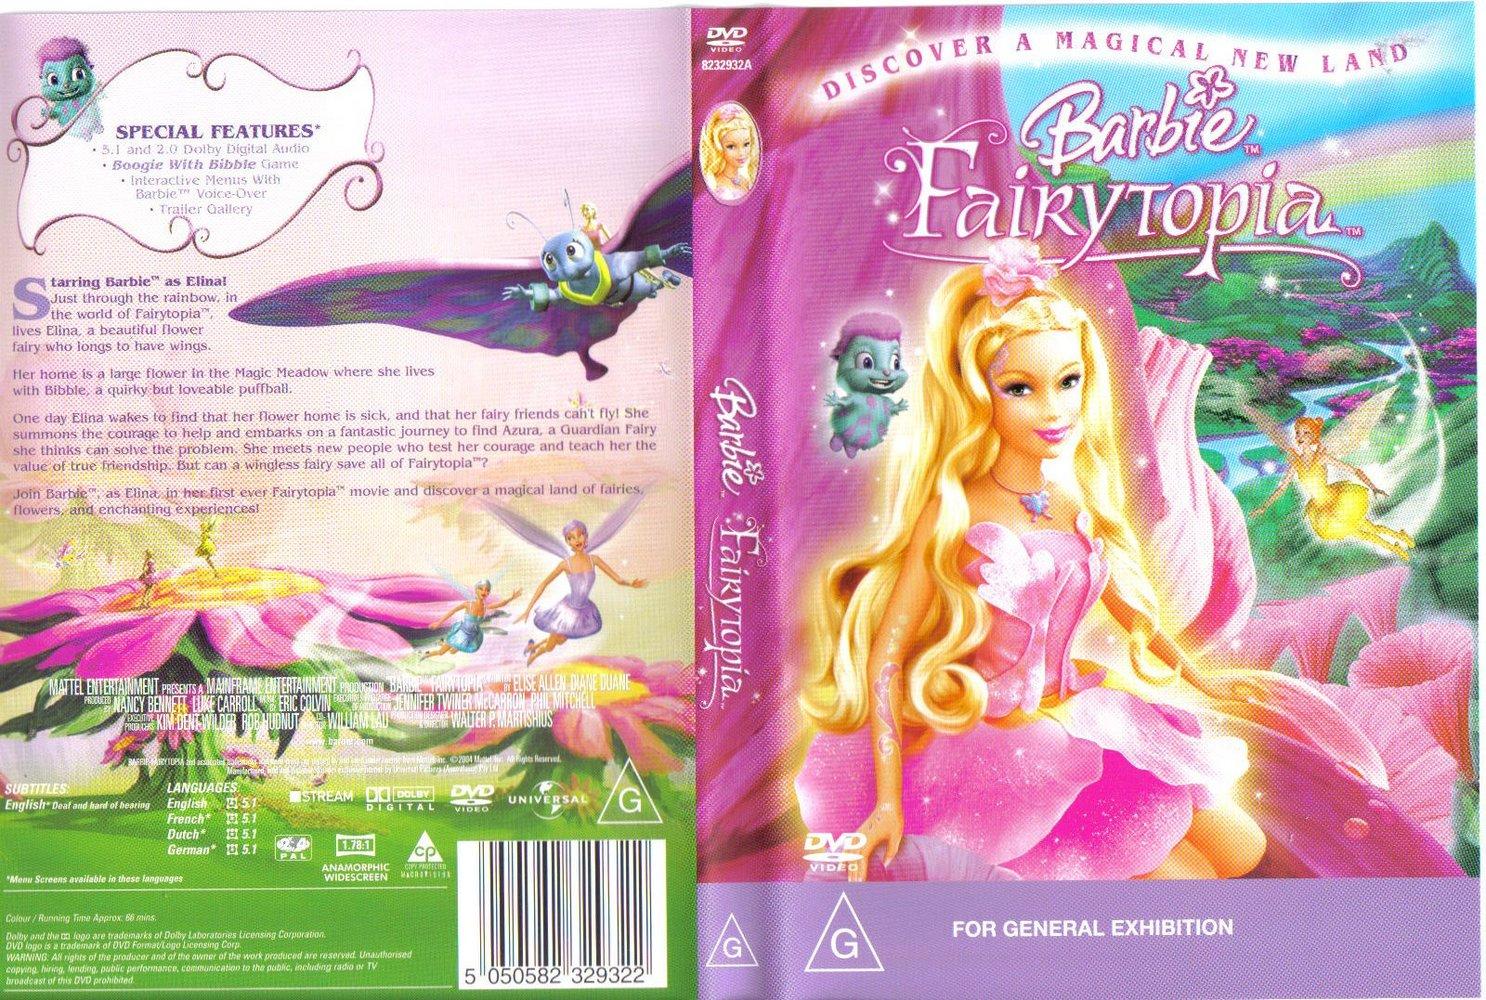 Phim nang tien caphilippin n 224 ng ti 234 n c 225 barbie fairytopia